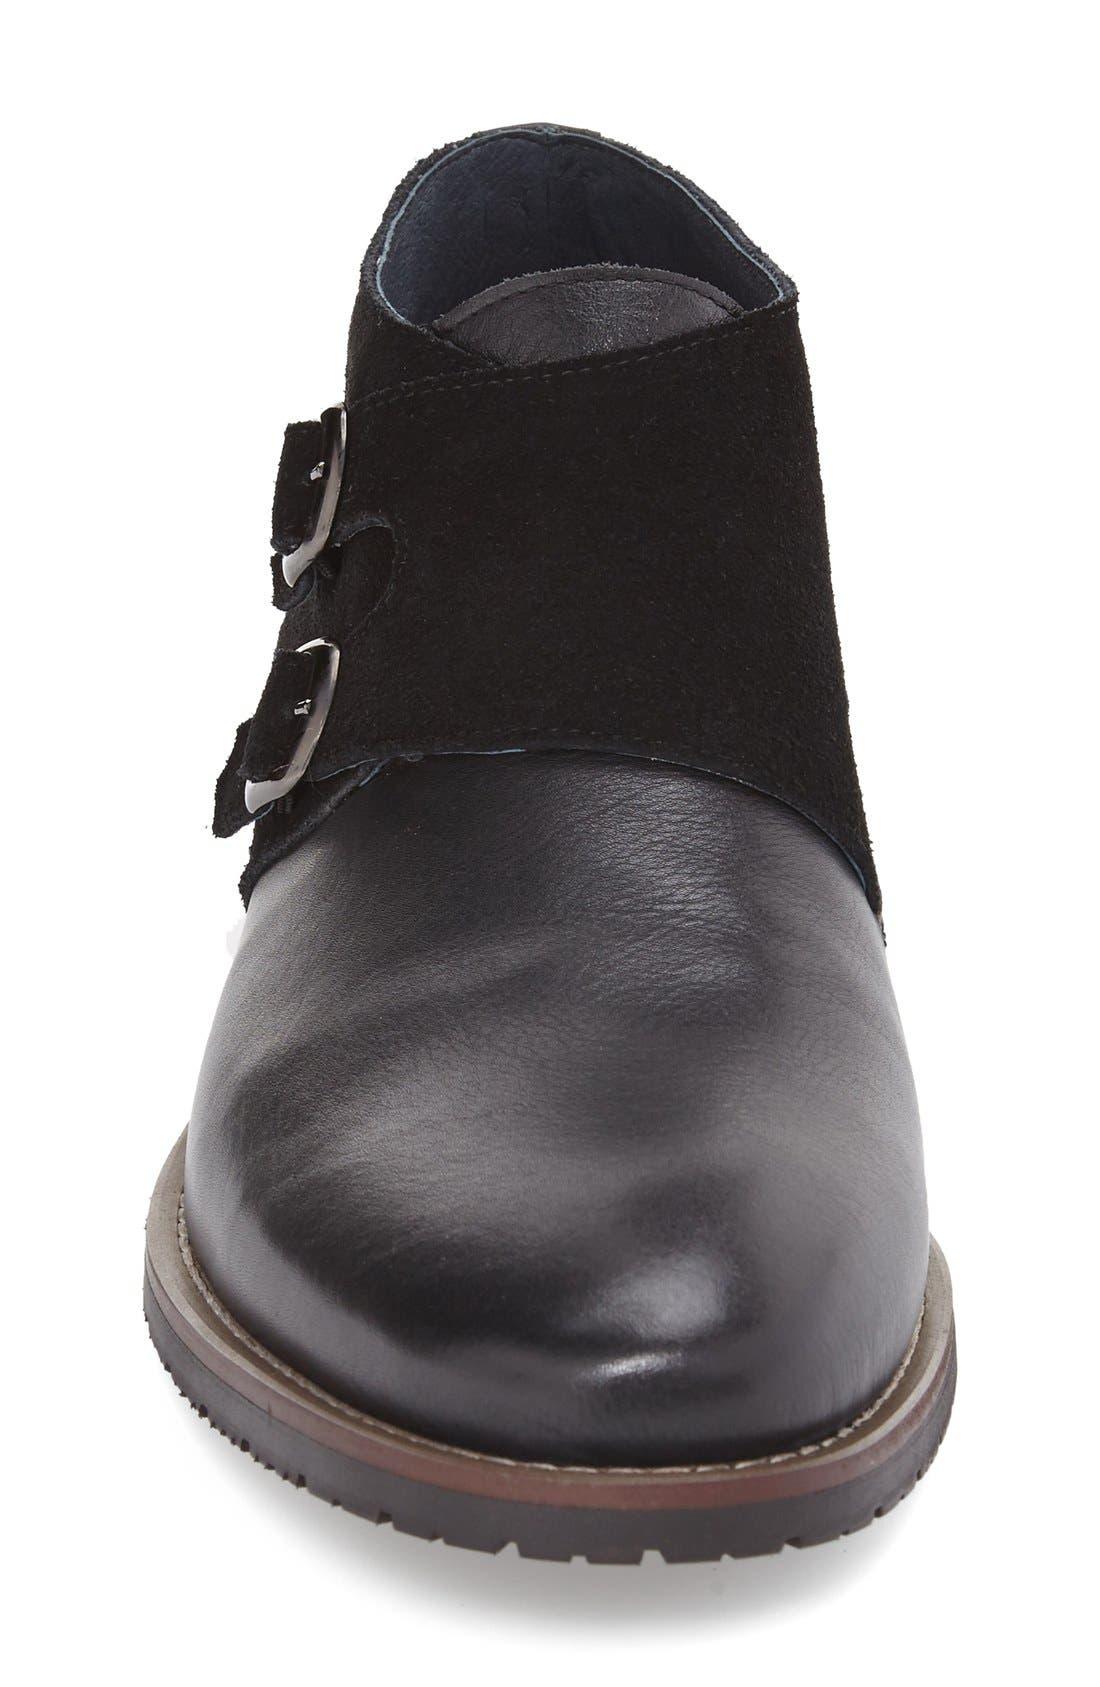 Alternate Image 3  - Zanzara 'Napoli' Double Monk Strap Shoe (Men)